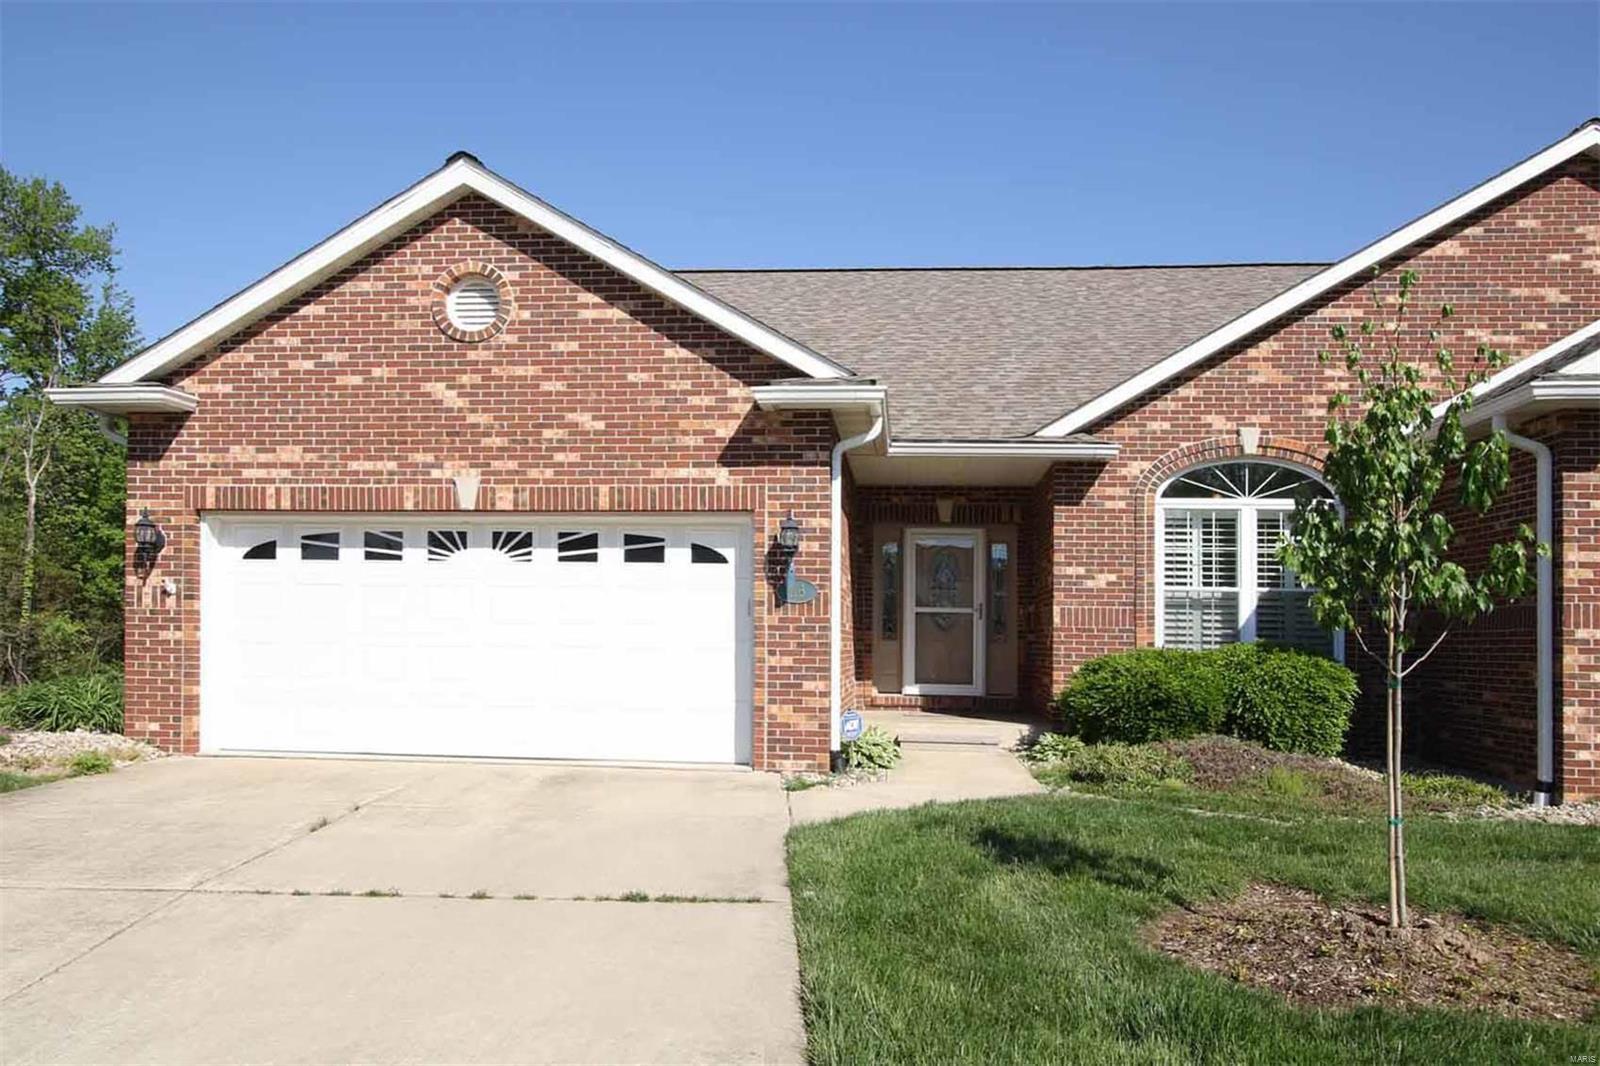 113 Summit Ridge Property Photo - Maryville, IL real estate listing